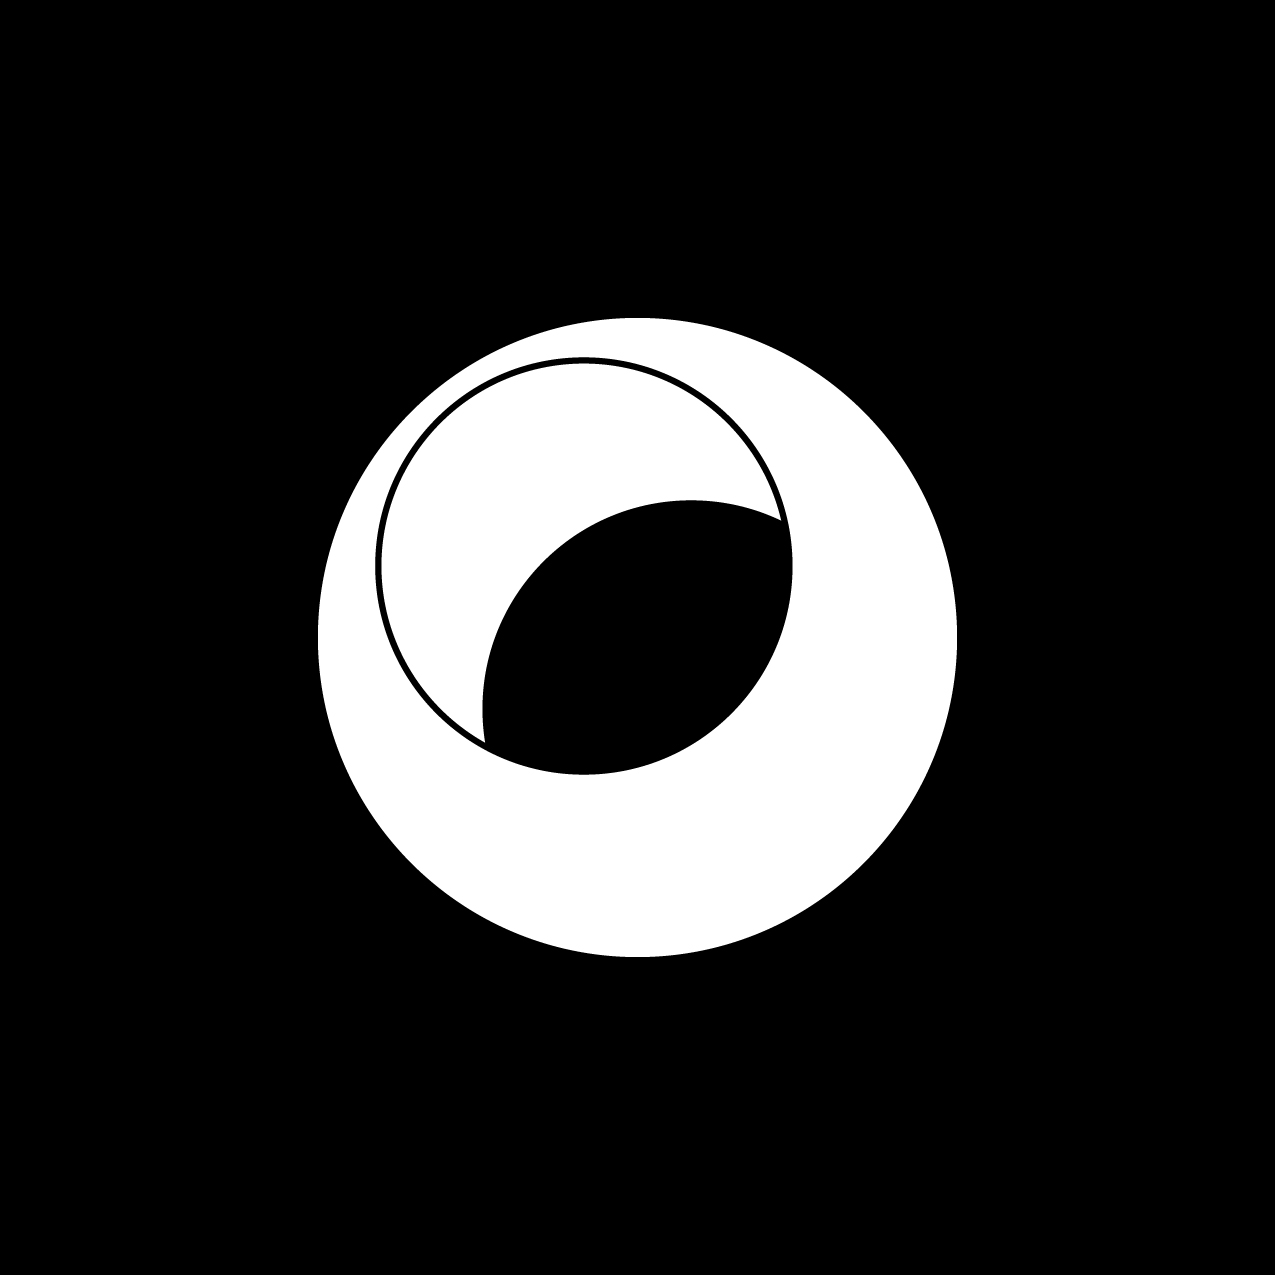 Letter O13 Design by Furia